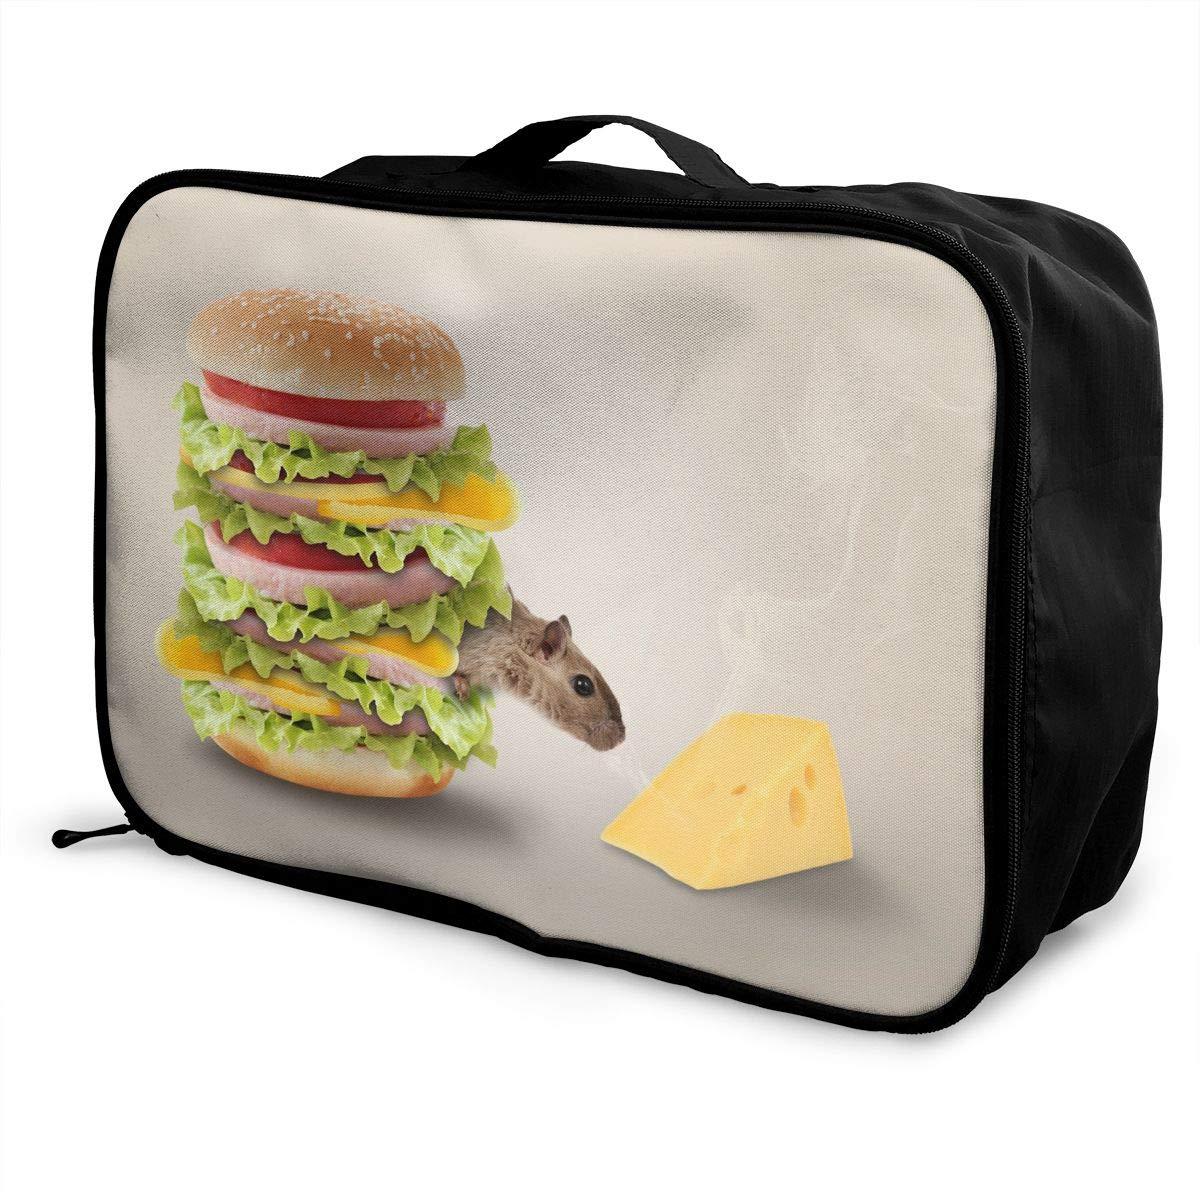 Travel Luggage Duffle Bag Lightweight Portable Handbag Hamburger Large Capacity Waterproof Foldable Storage Tote